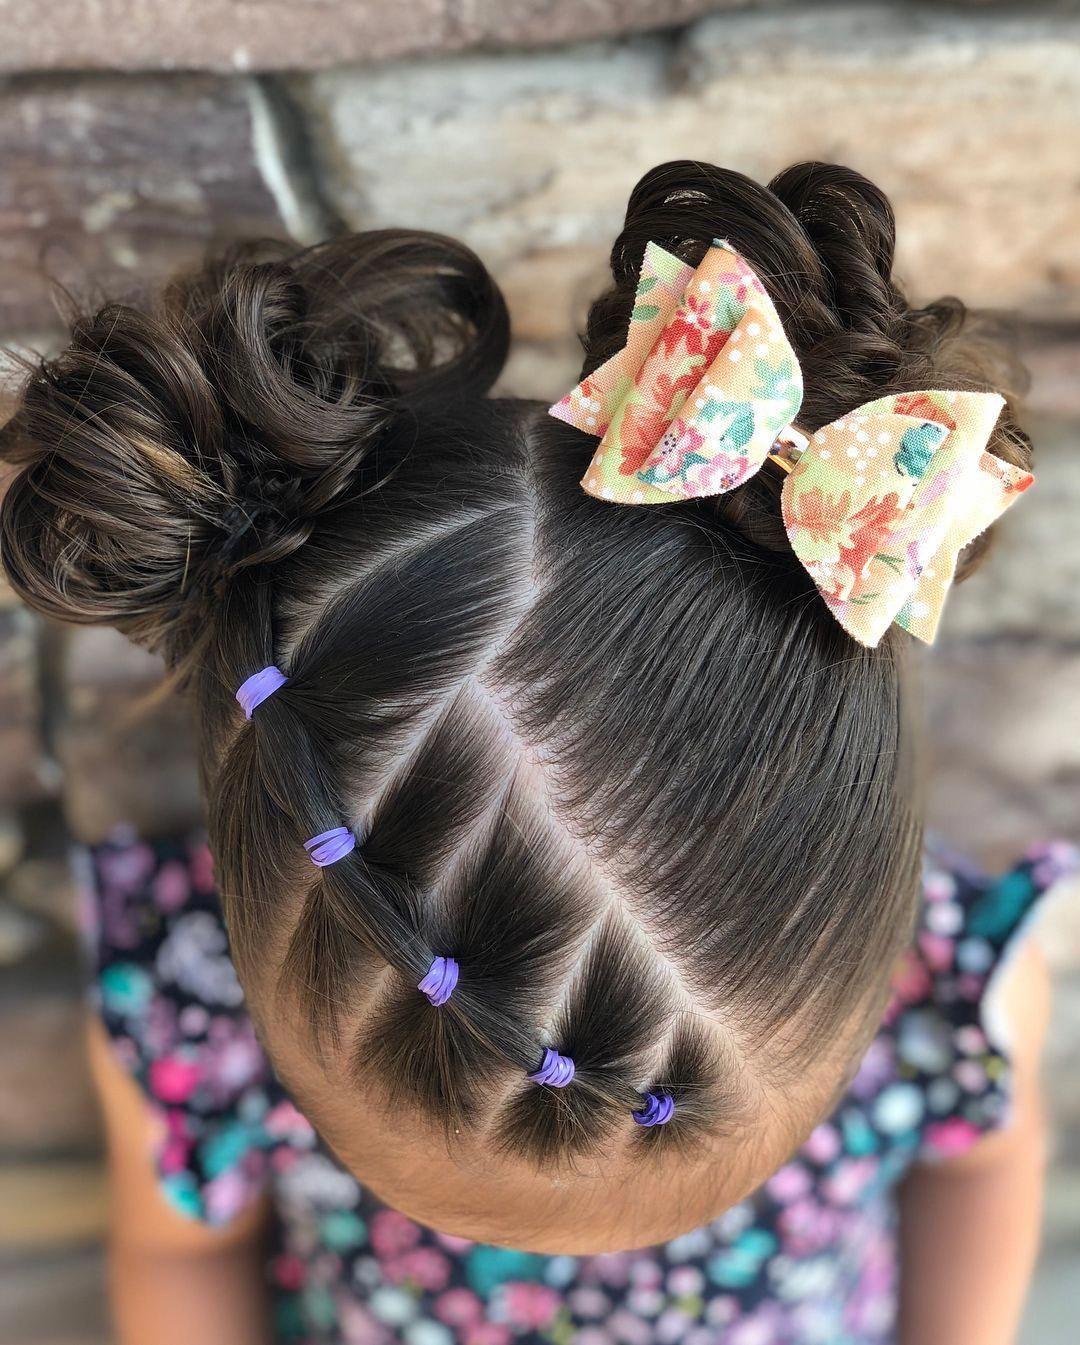 Great Short Haircuts Beautiful Haircuts For Girls Nice Hairstyles For Kids 20190506 Kids Hairstyles Girls Girl Hair Dos Lil Girl Hairstyles